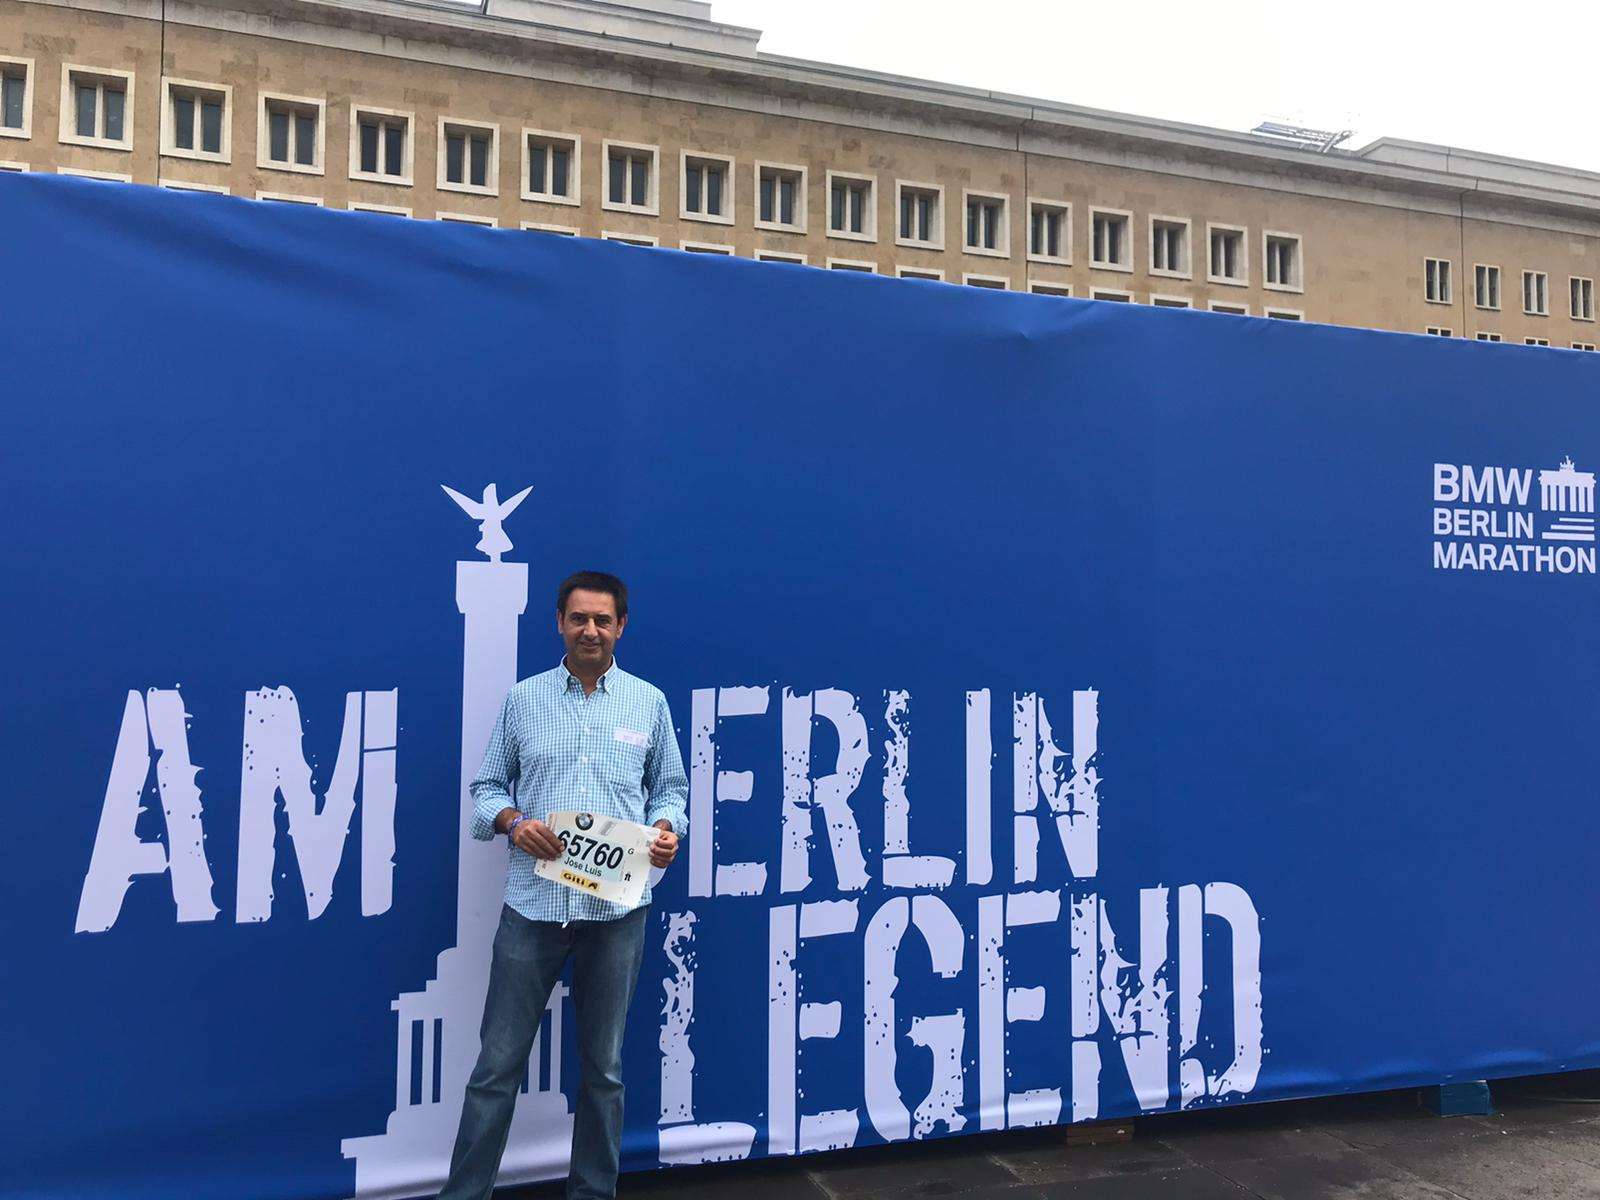 MARATON DE BERLIN 2019